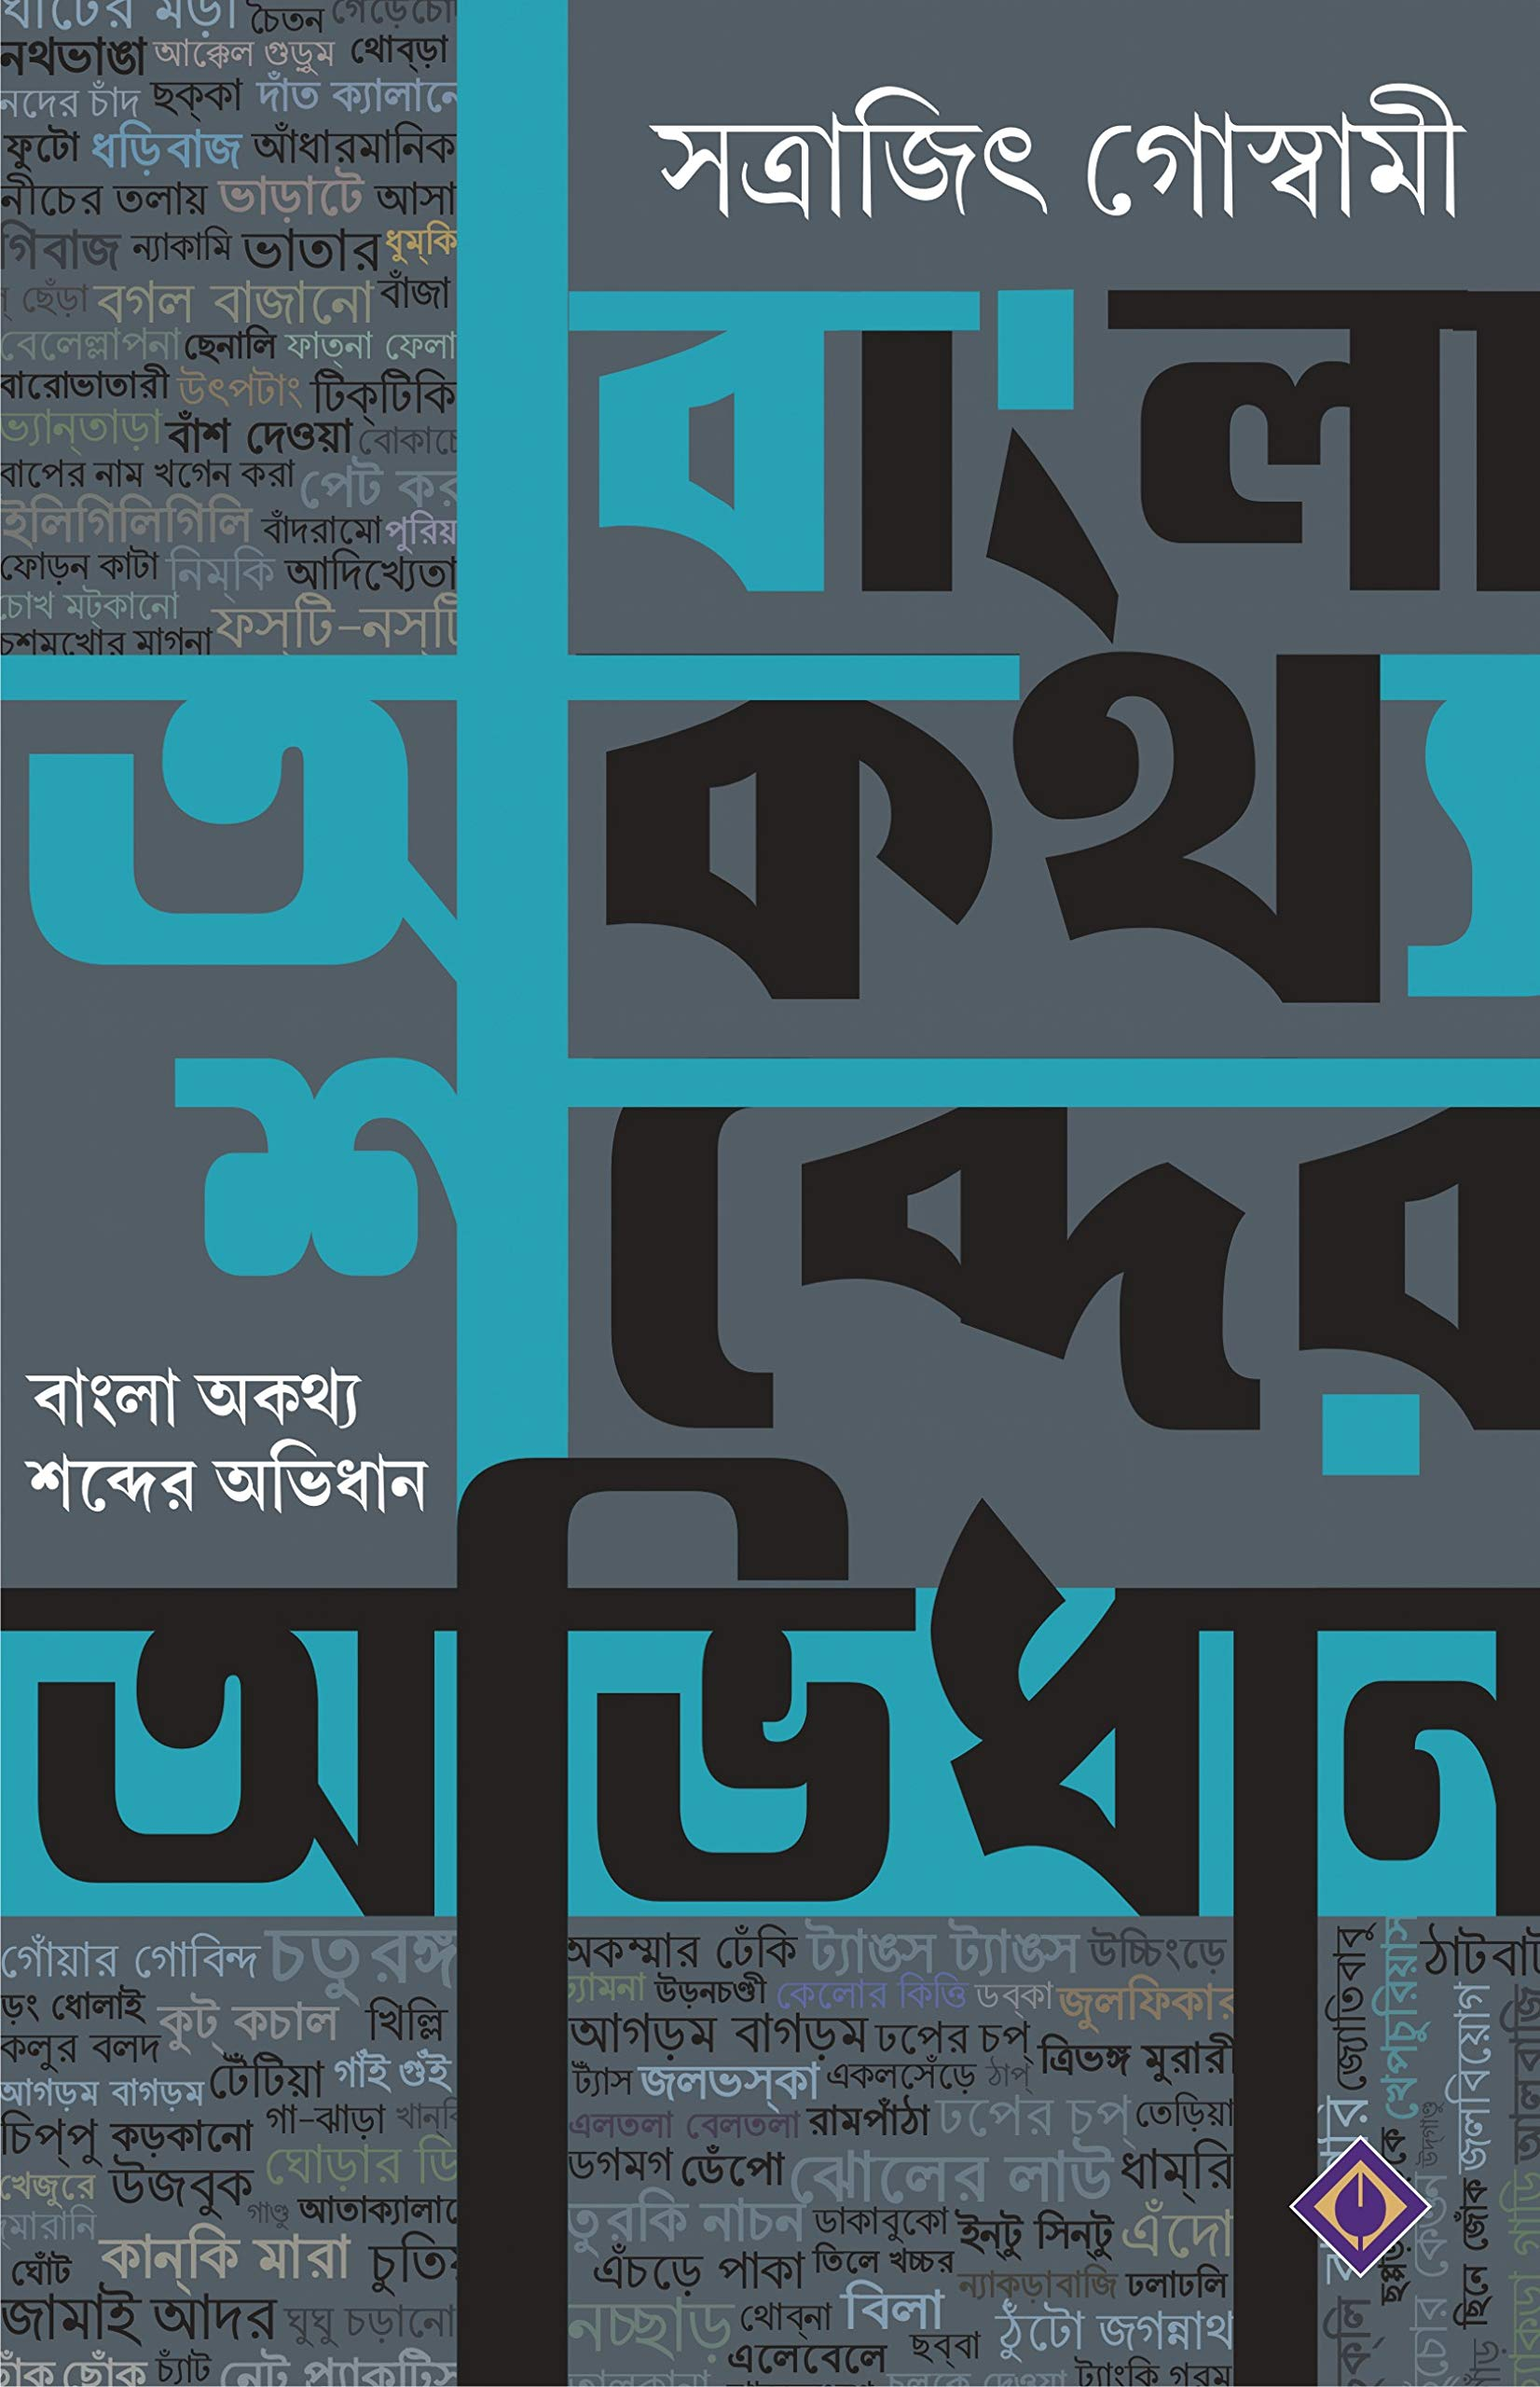 Bangla Aukathyo Shobder Abhidhan   Bengali Dictionary of Slang Words   Bangla Obhidhan   Colloquial Terms in Bengali Language